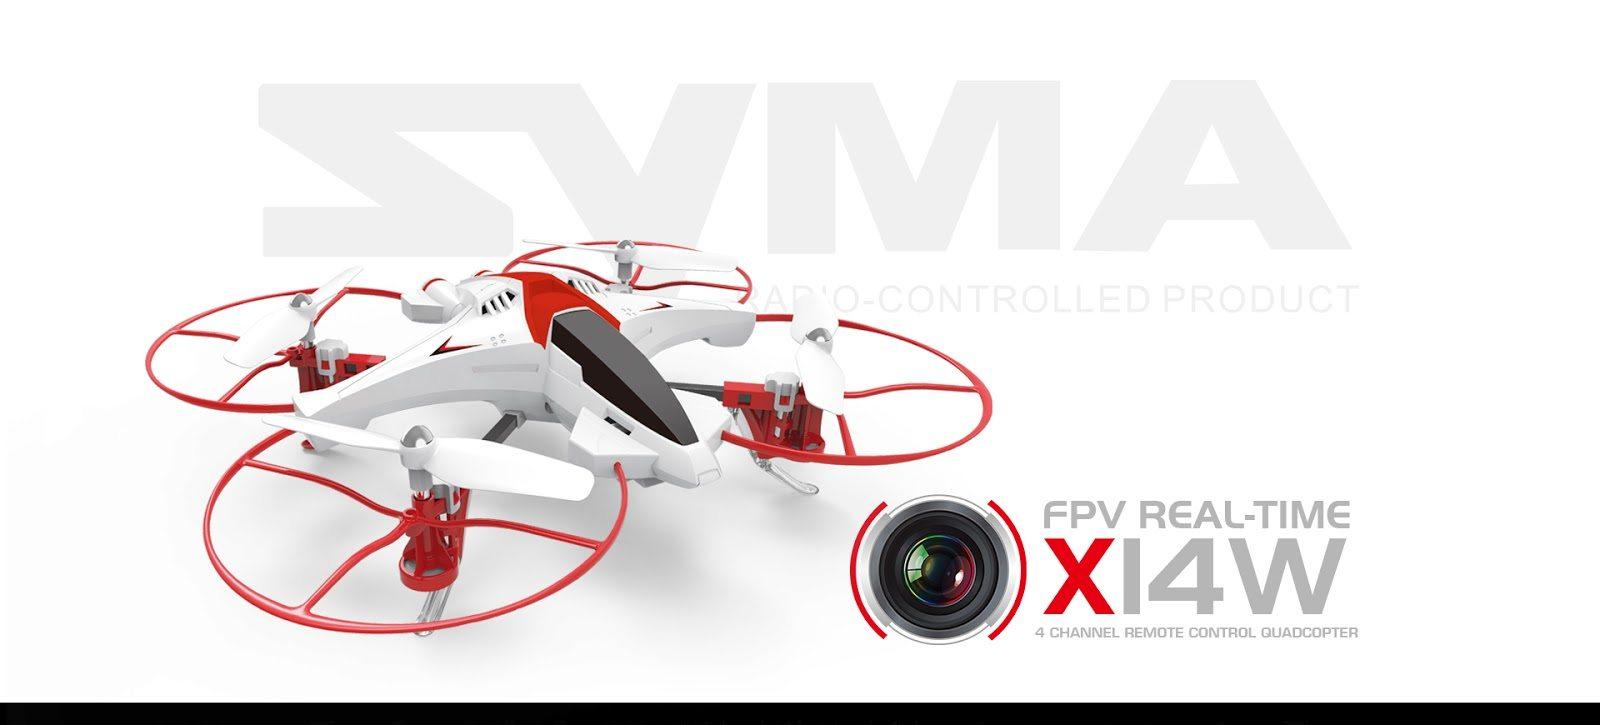 کوادکوپتر سایما x14w